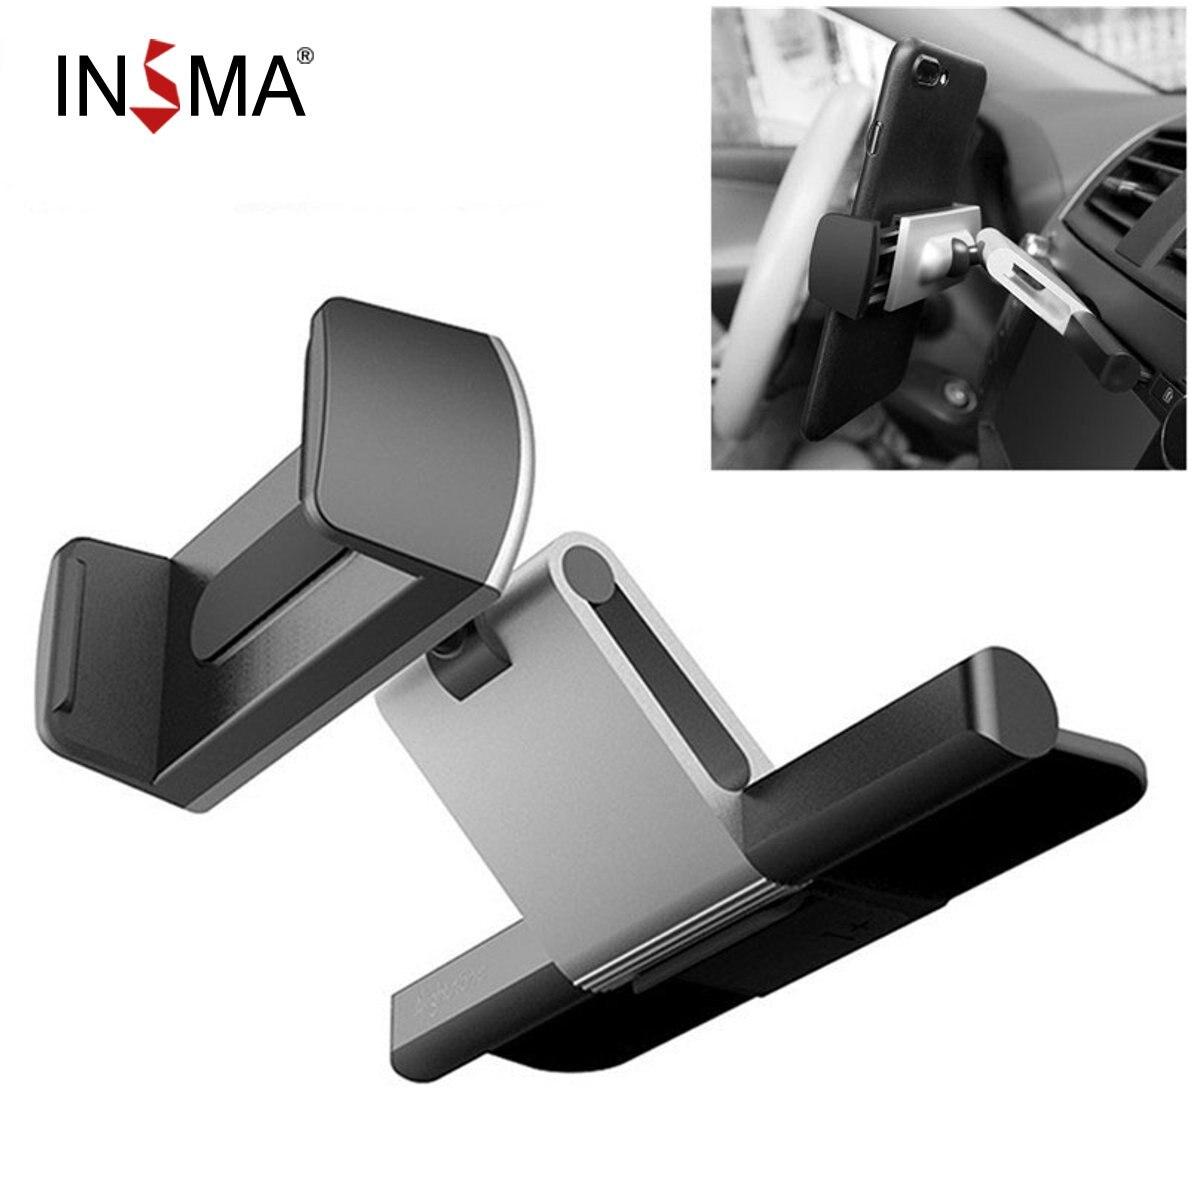 INSMA Aluminum Car CD Slot Mount Cradle Holder Universal Mobile Phone Stand Holder Bracket for iPhone for Samsung GPS Car Holder